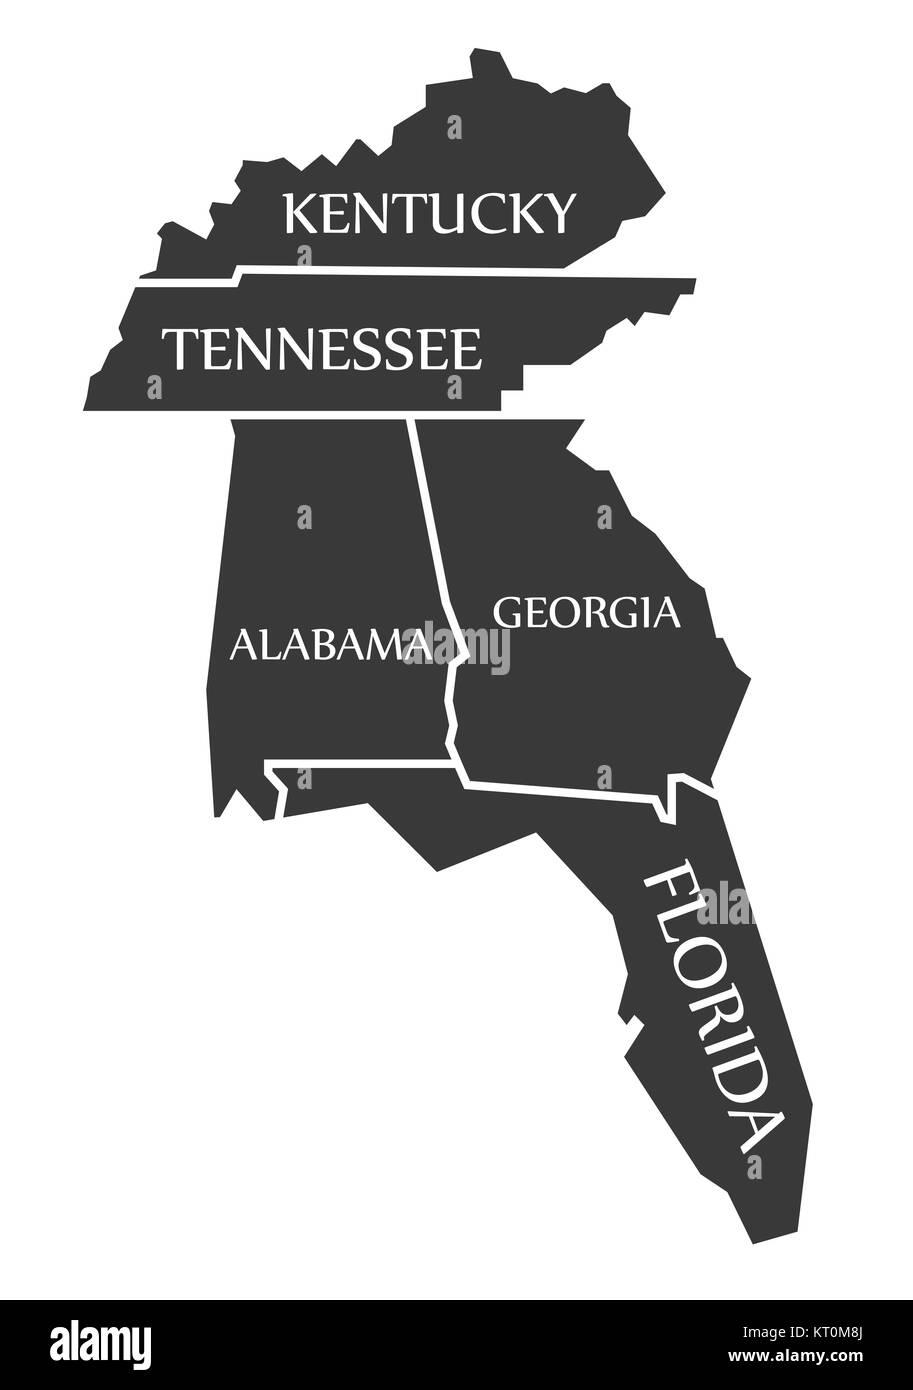 Map Of Alabama And Florida.Kentucky Tennessee Alabama Georgia Florida Map Labelled